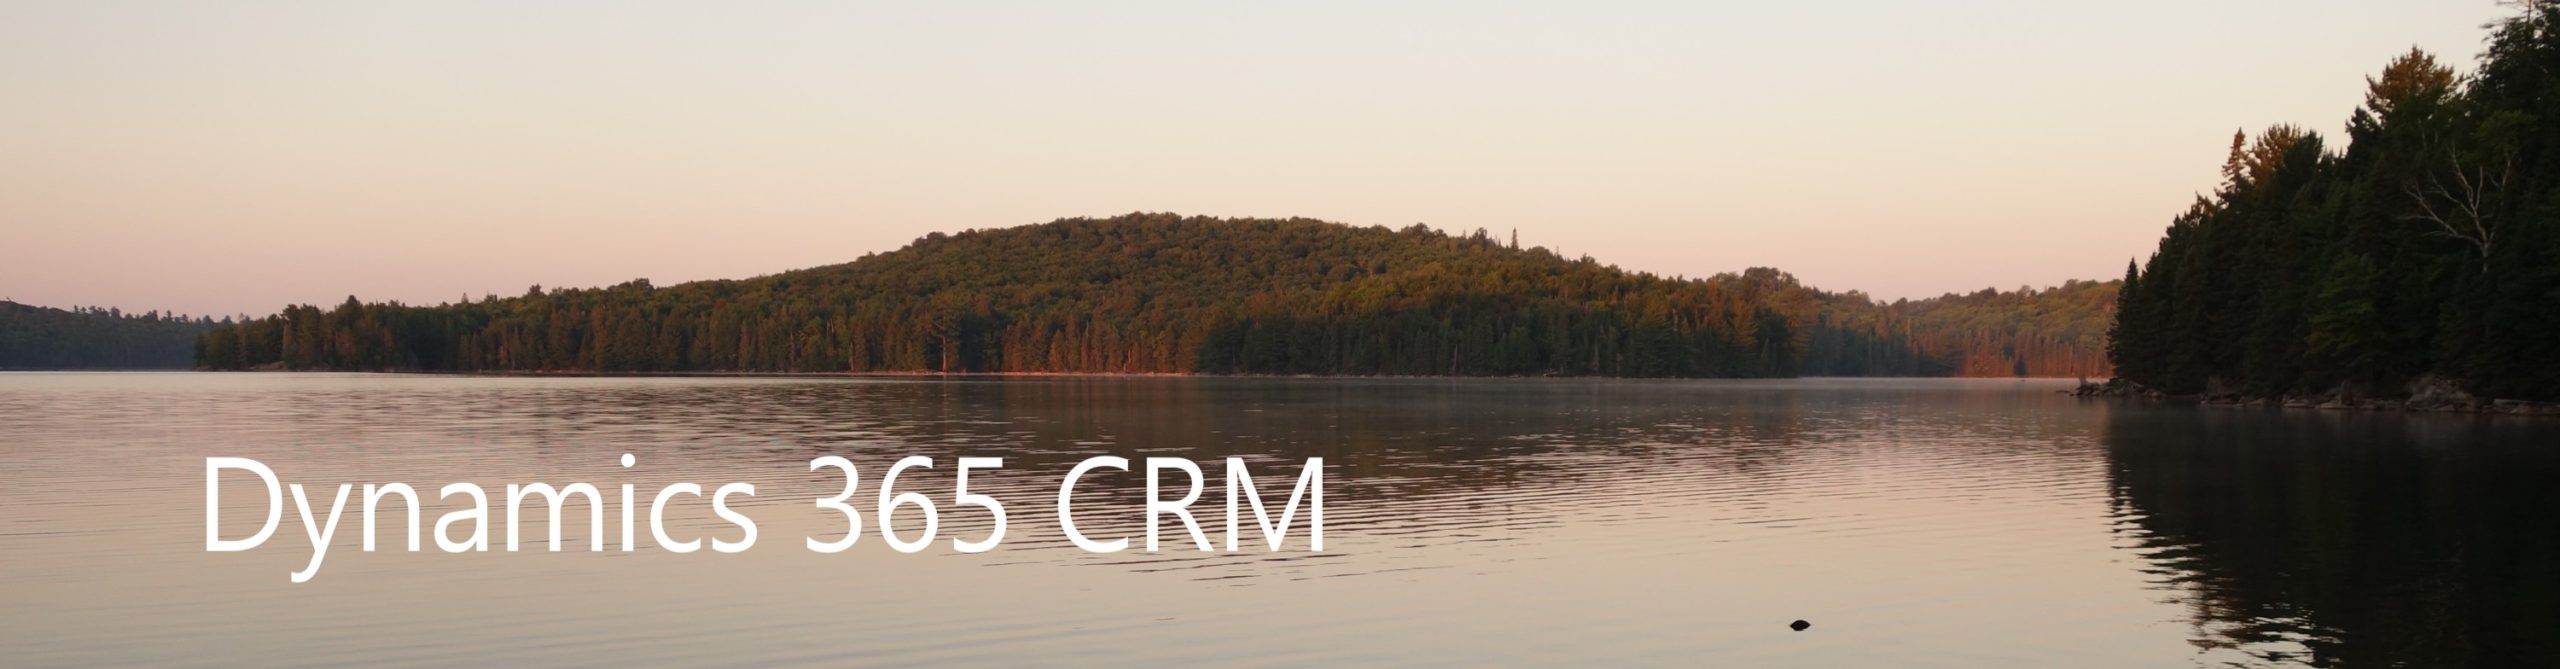 Dynamics 365 CRM